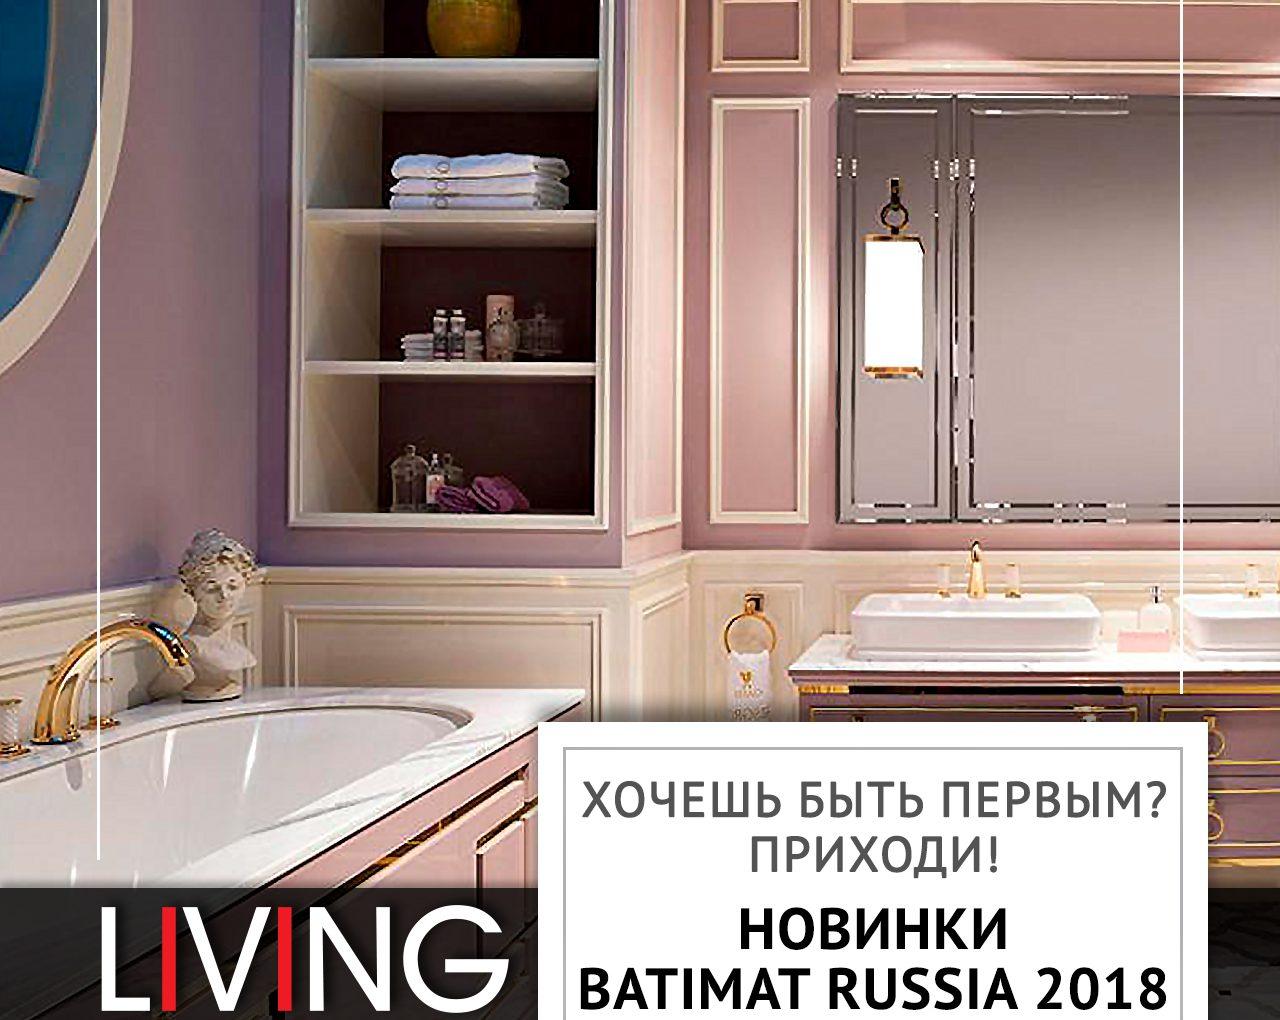 Рабочая встреча - новинки Batimat Russia 2018